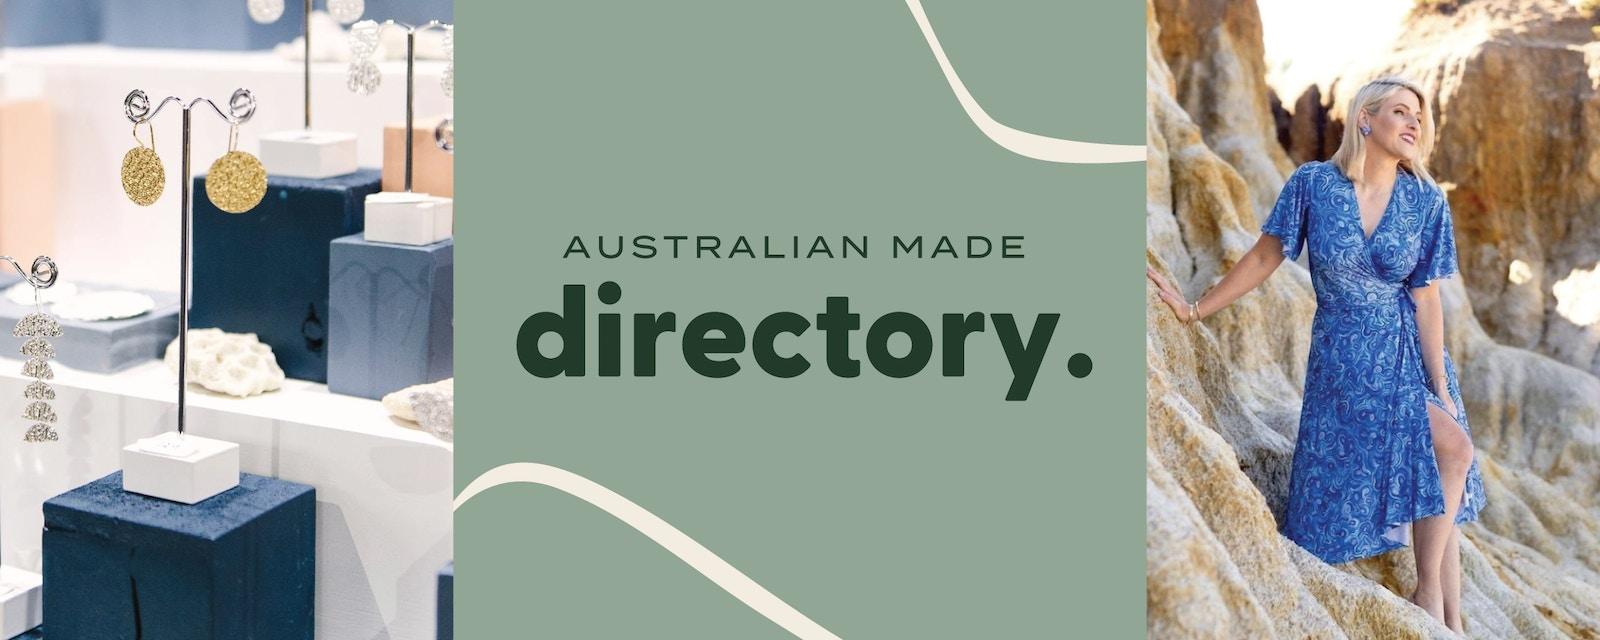 Meet Our Designers - Australian Made Directory